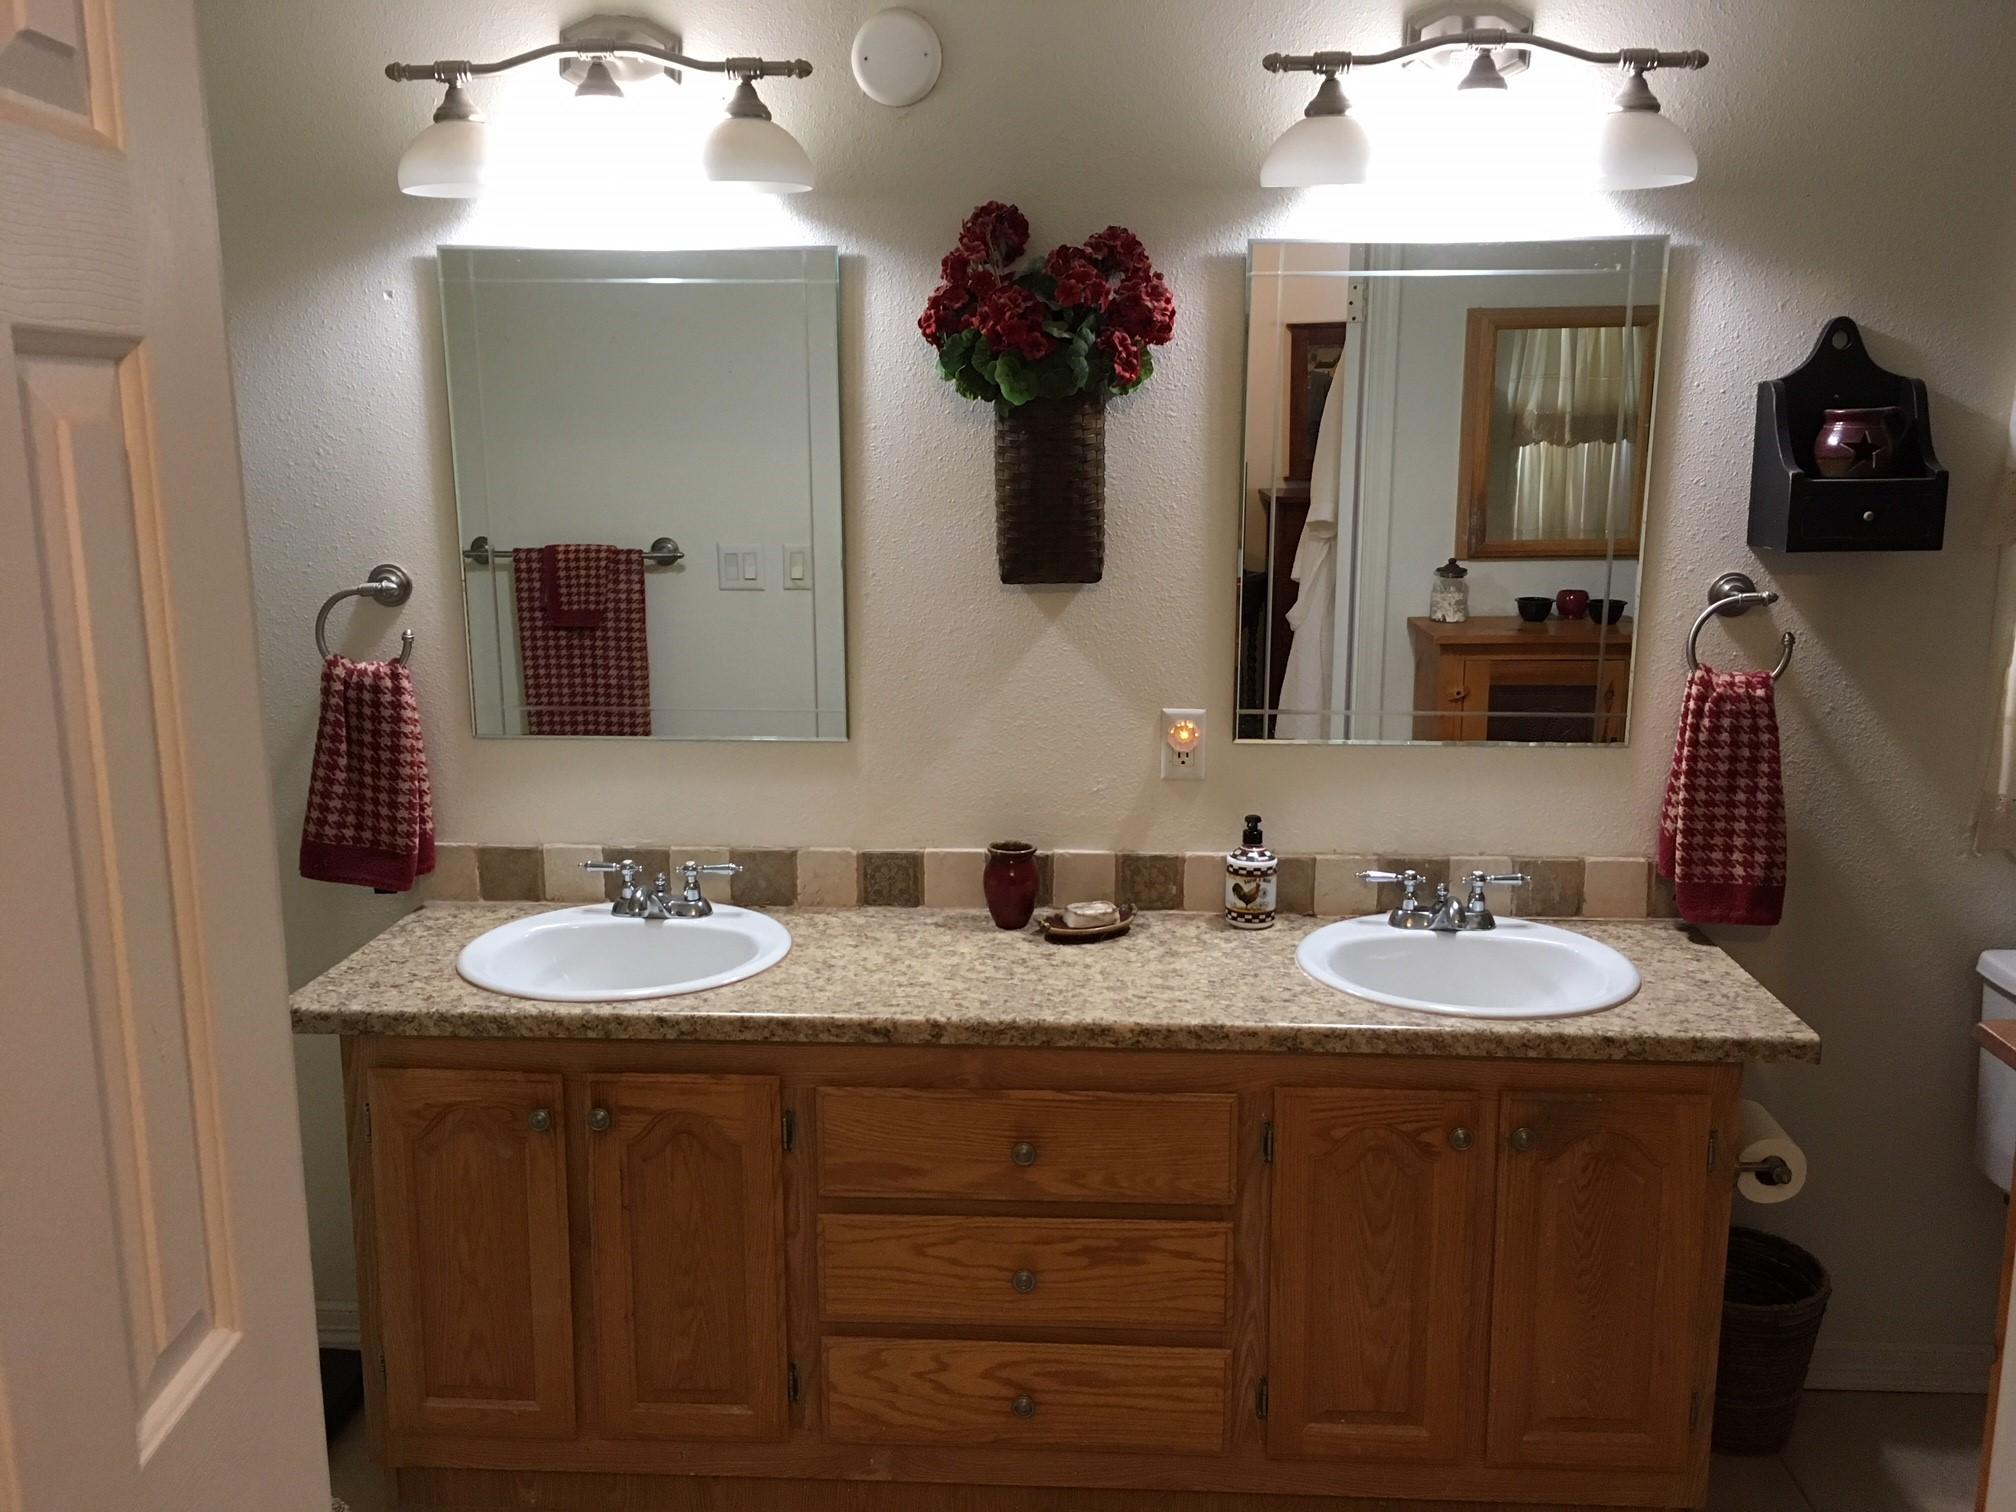 Sinks2